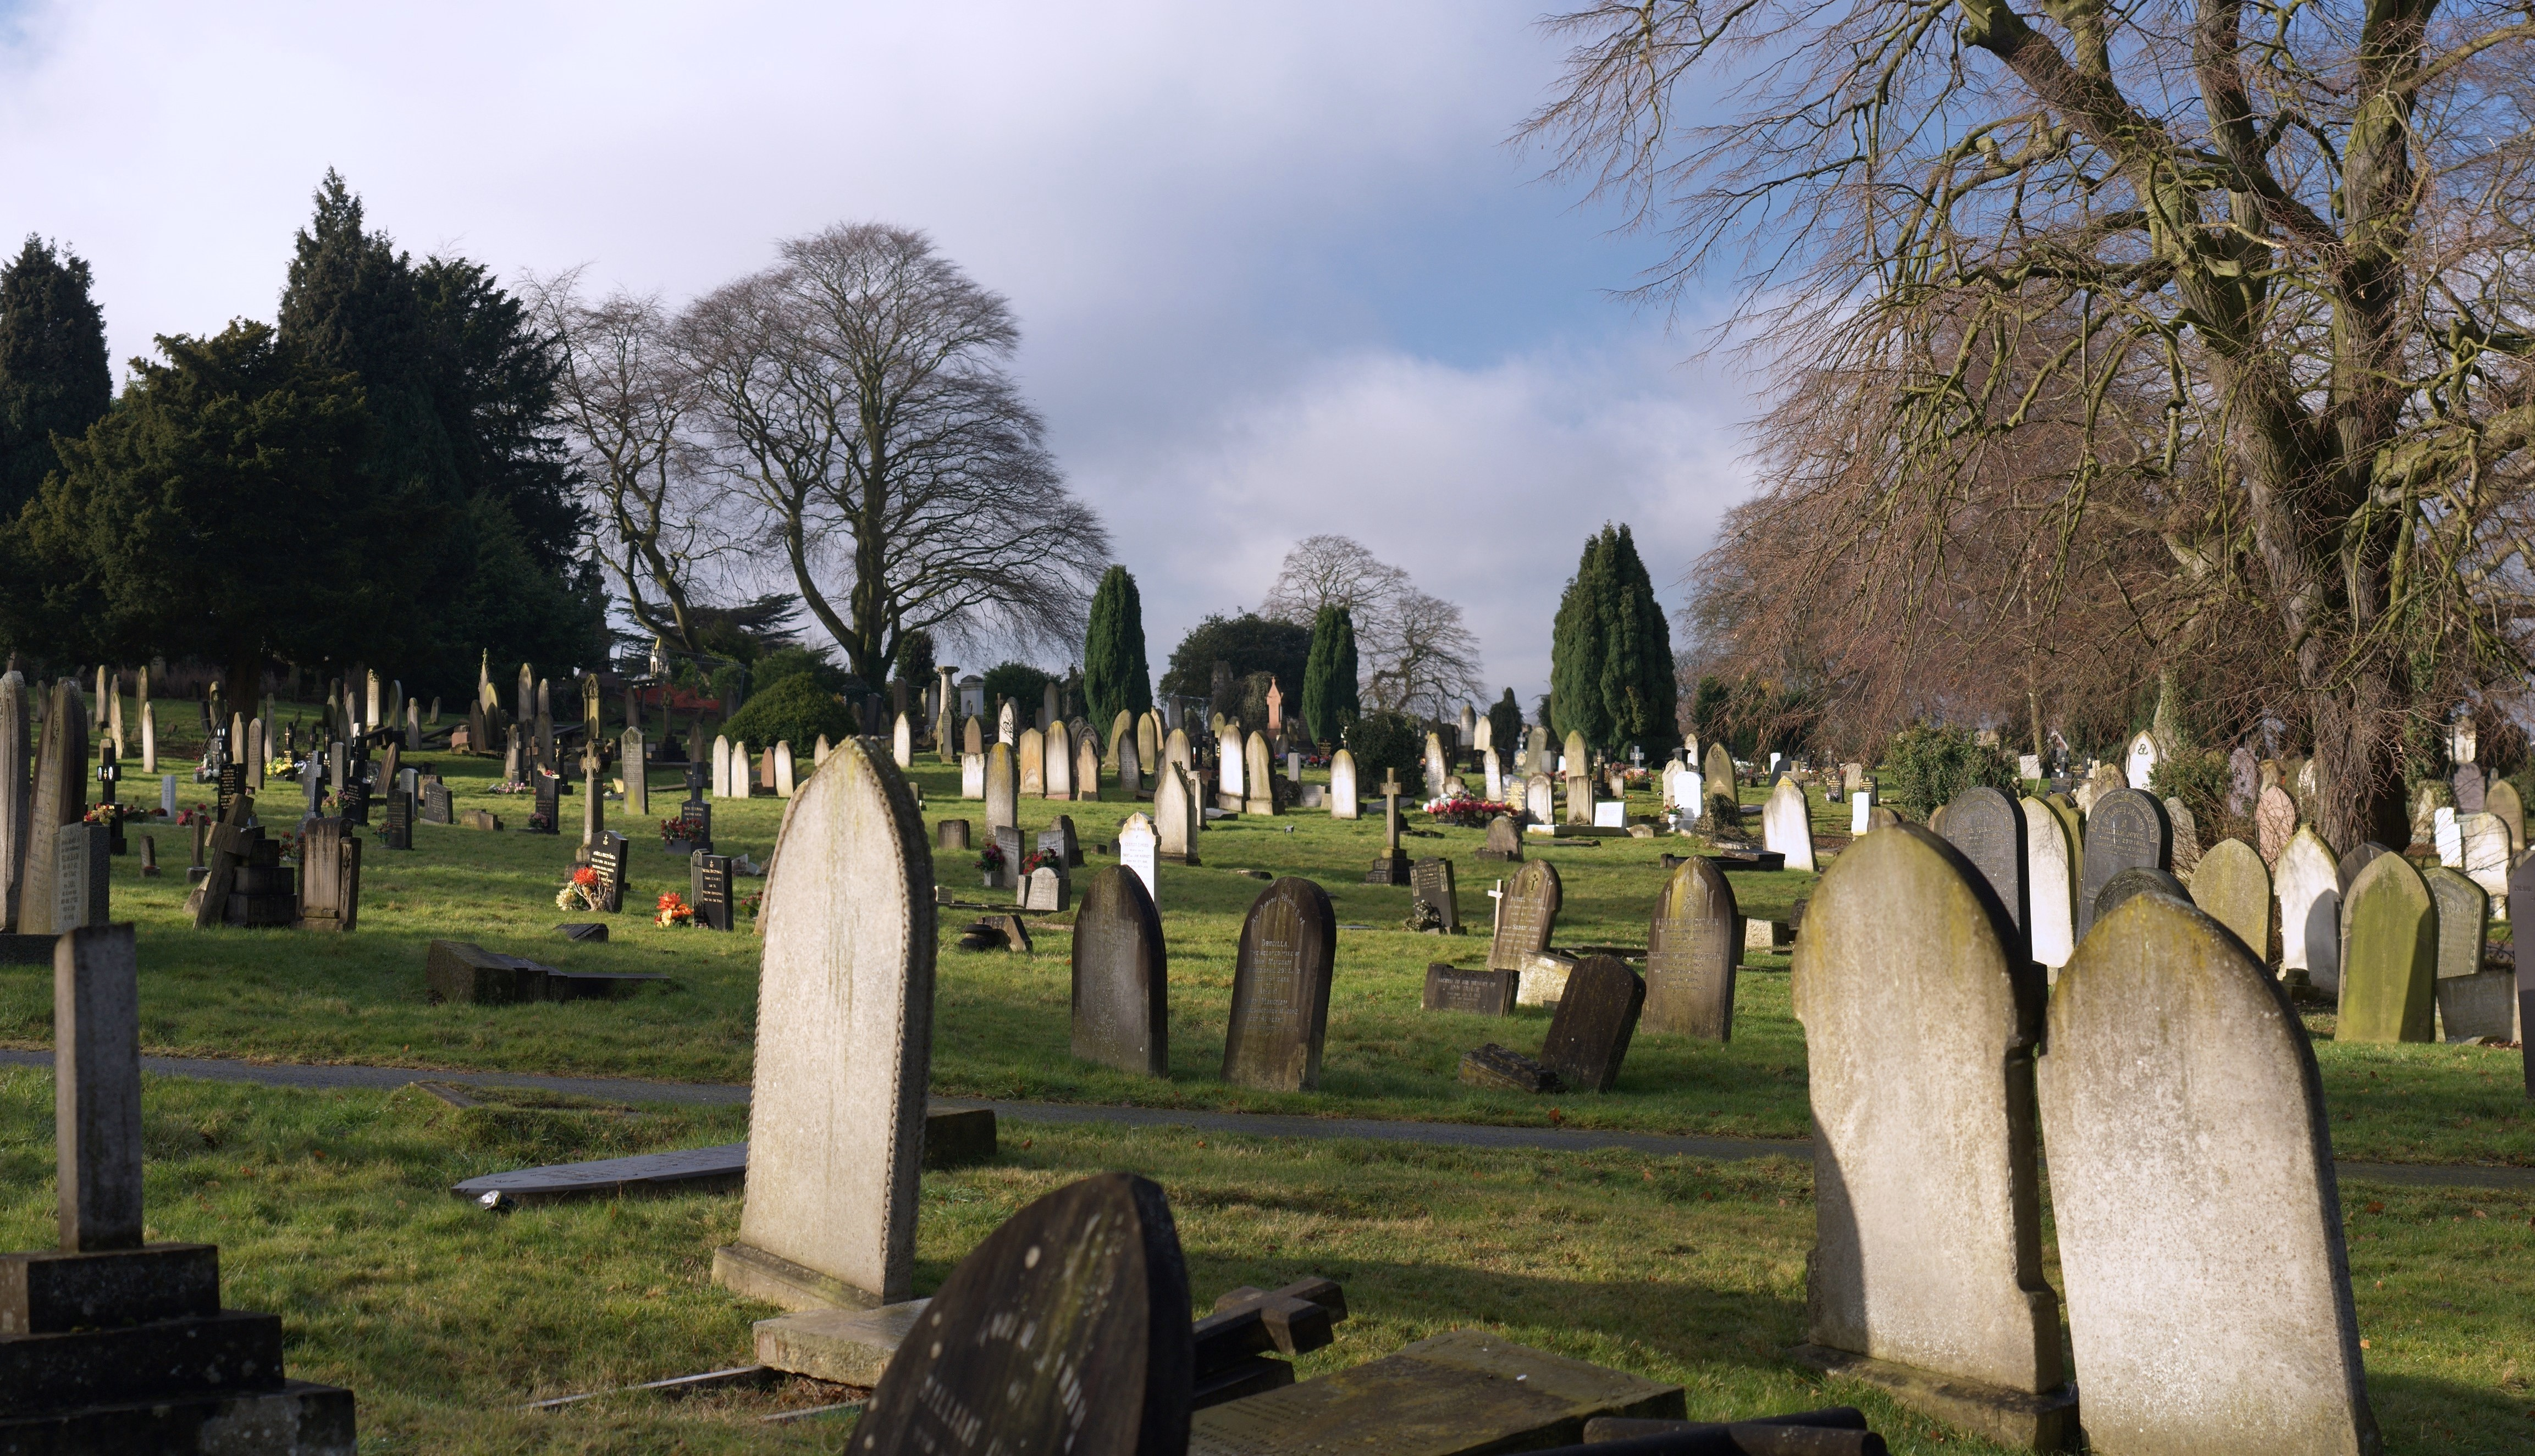 pics photos cemetery - photo #34